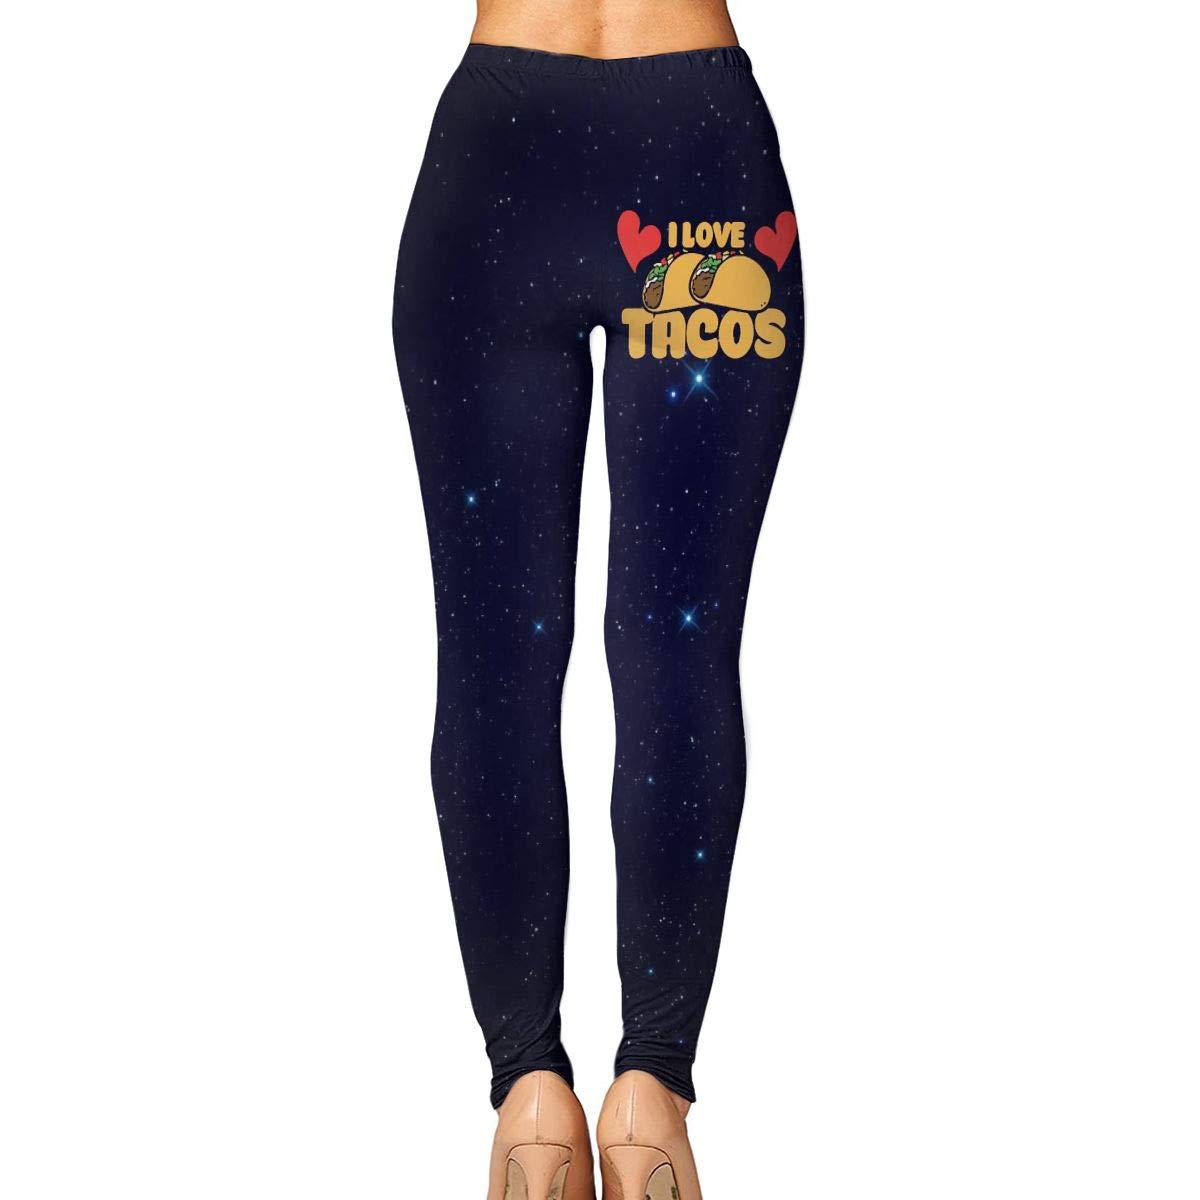 Amazon.com: I Love Tacos Womens Yoga Pants High Waist Capri ...